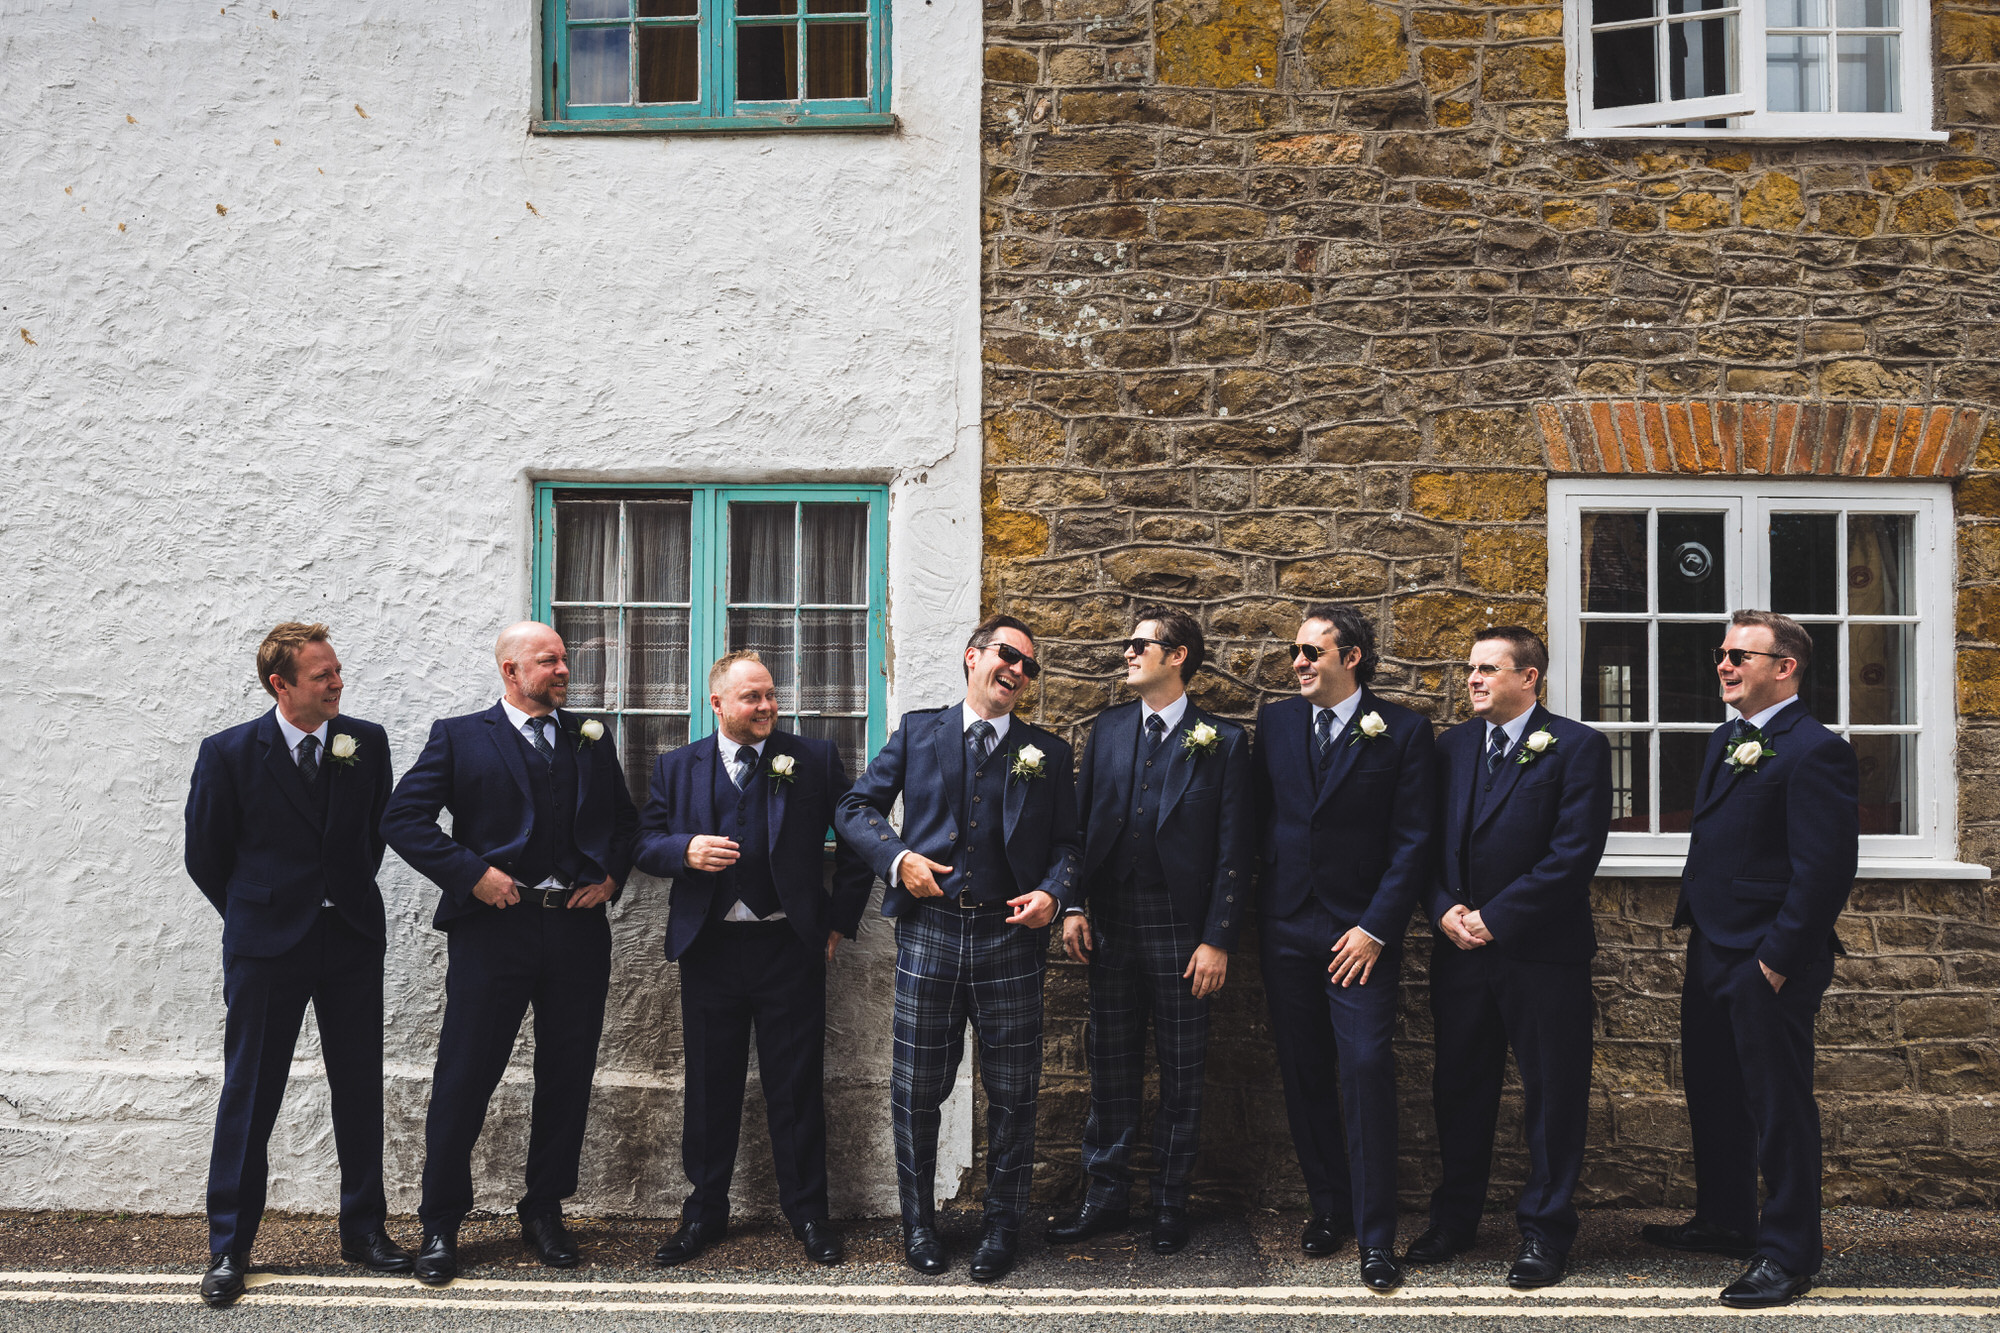 Dorset marquee wedding by the sea simon biffen photography 4